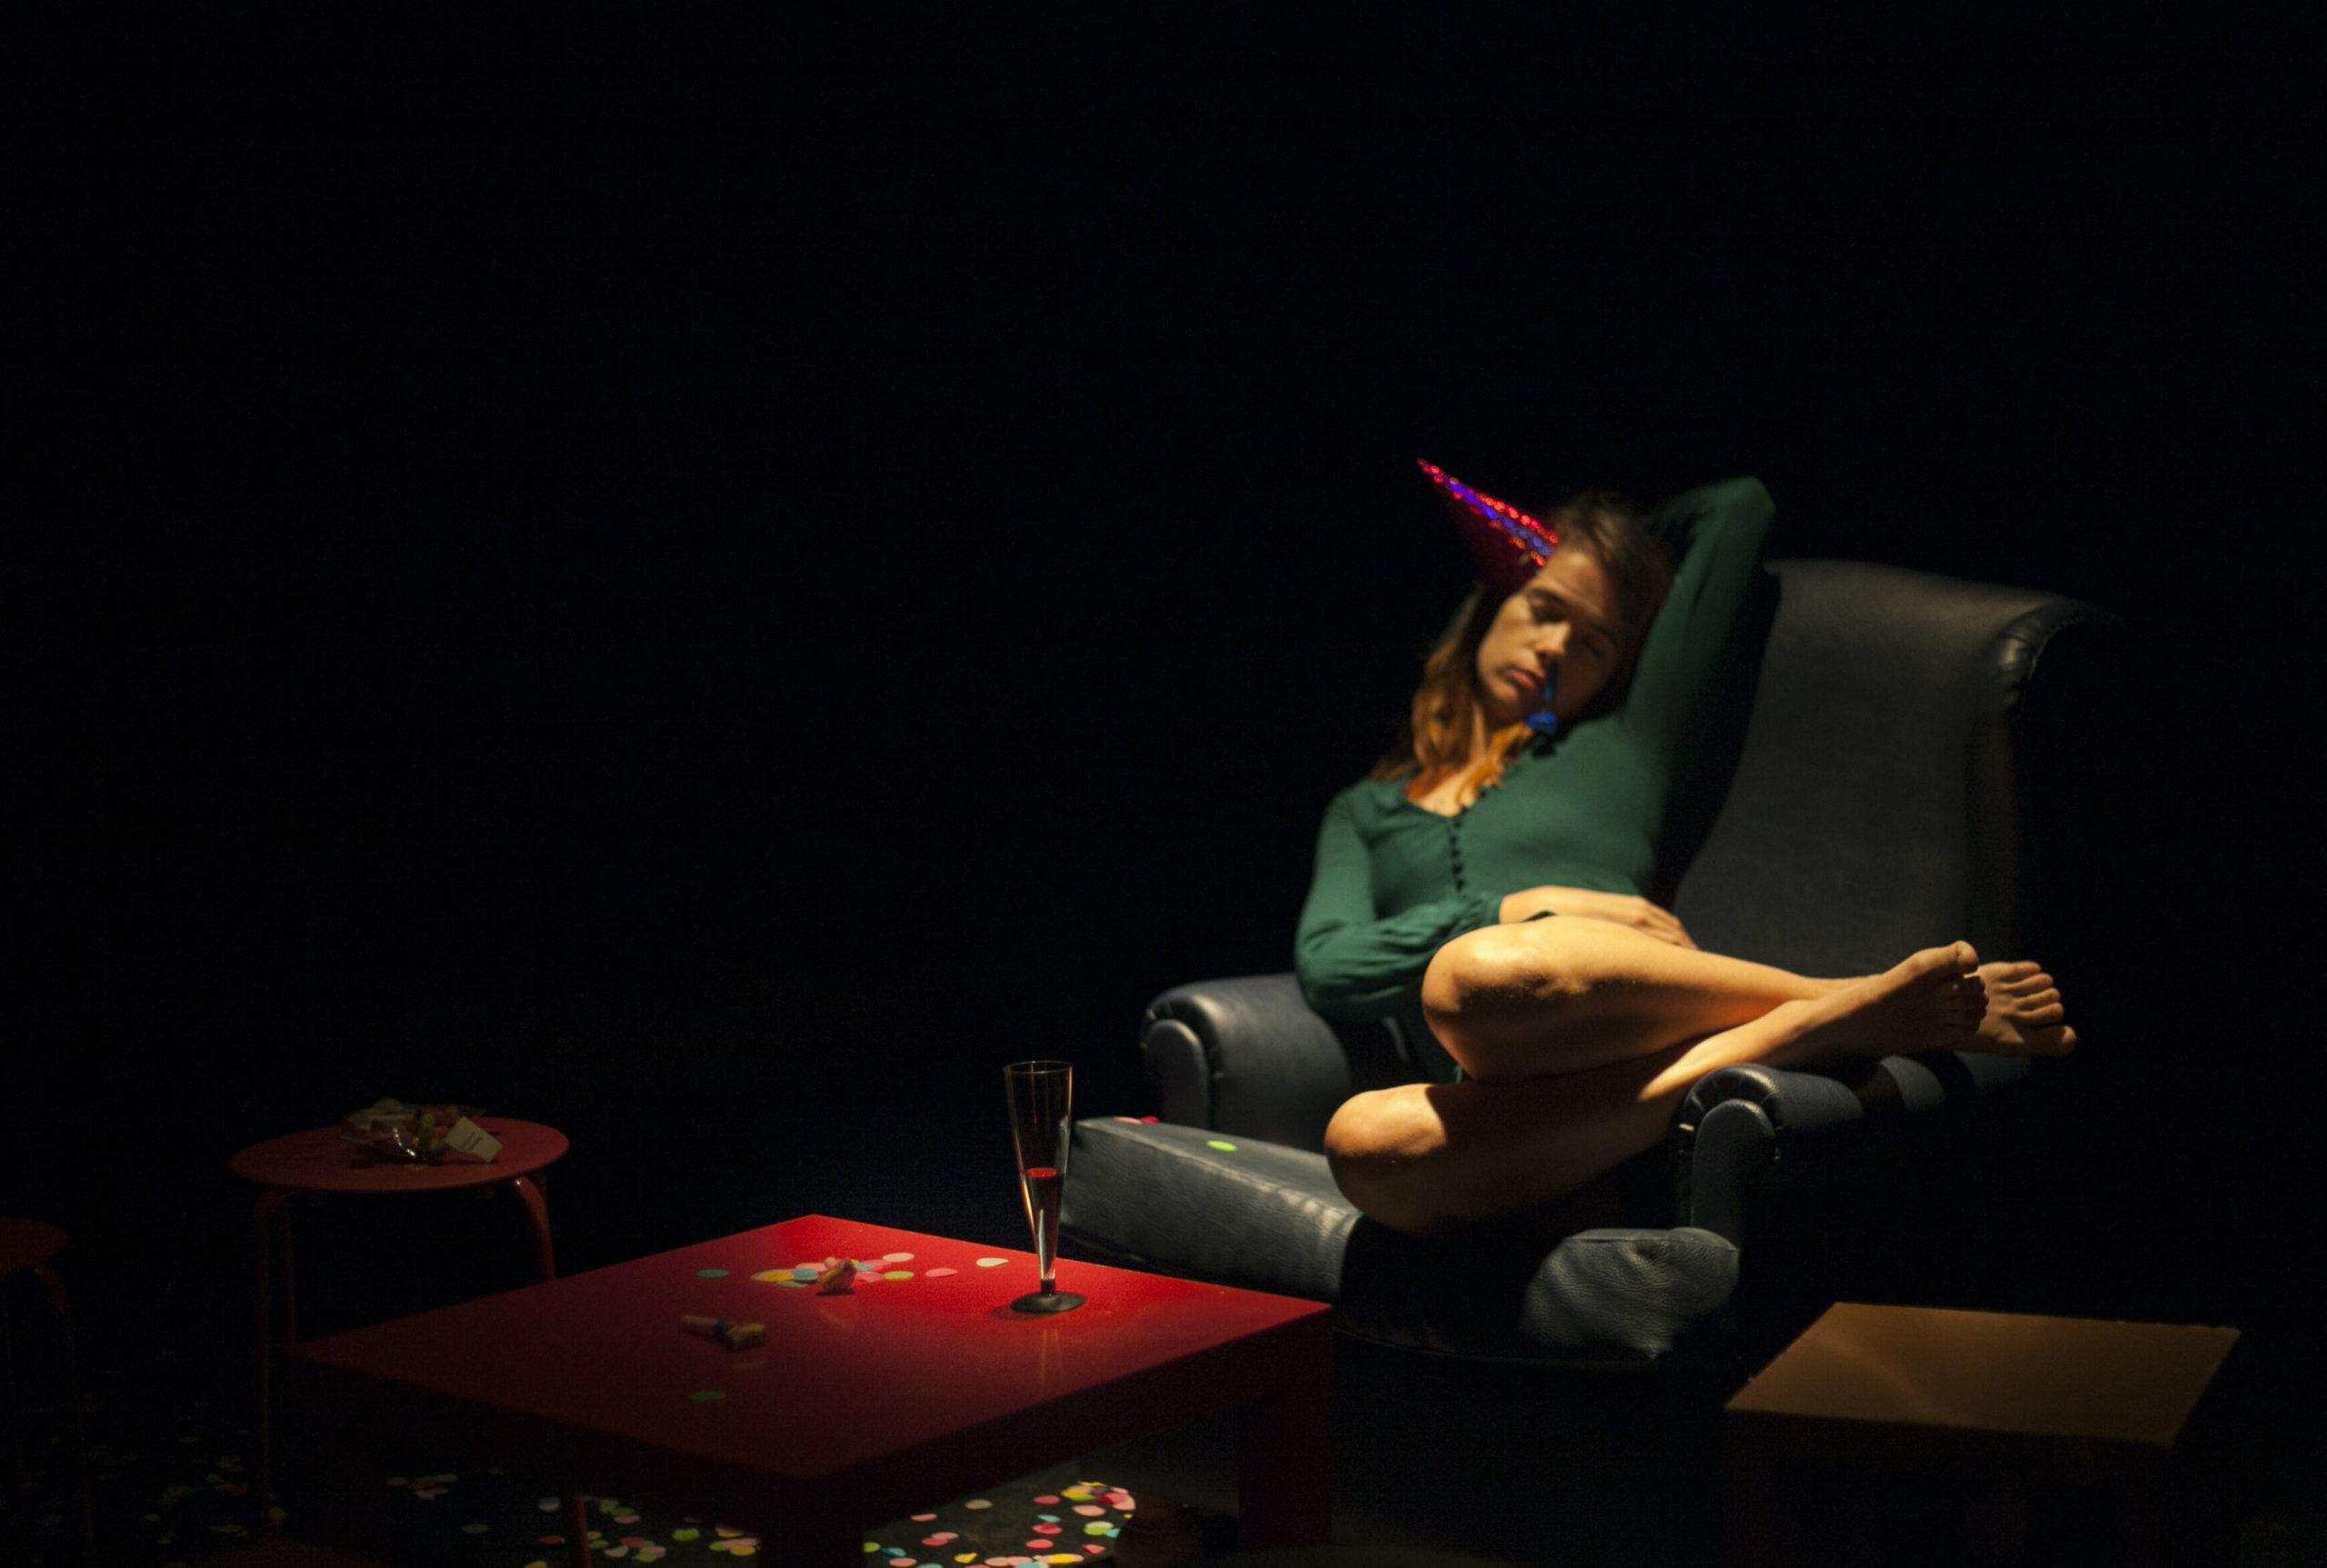 L'aniversari | Teatro de lo Inestable